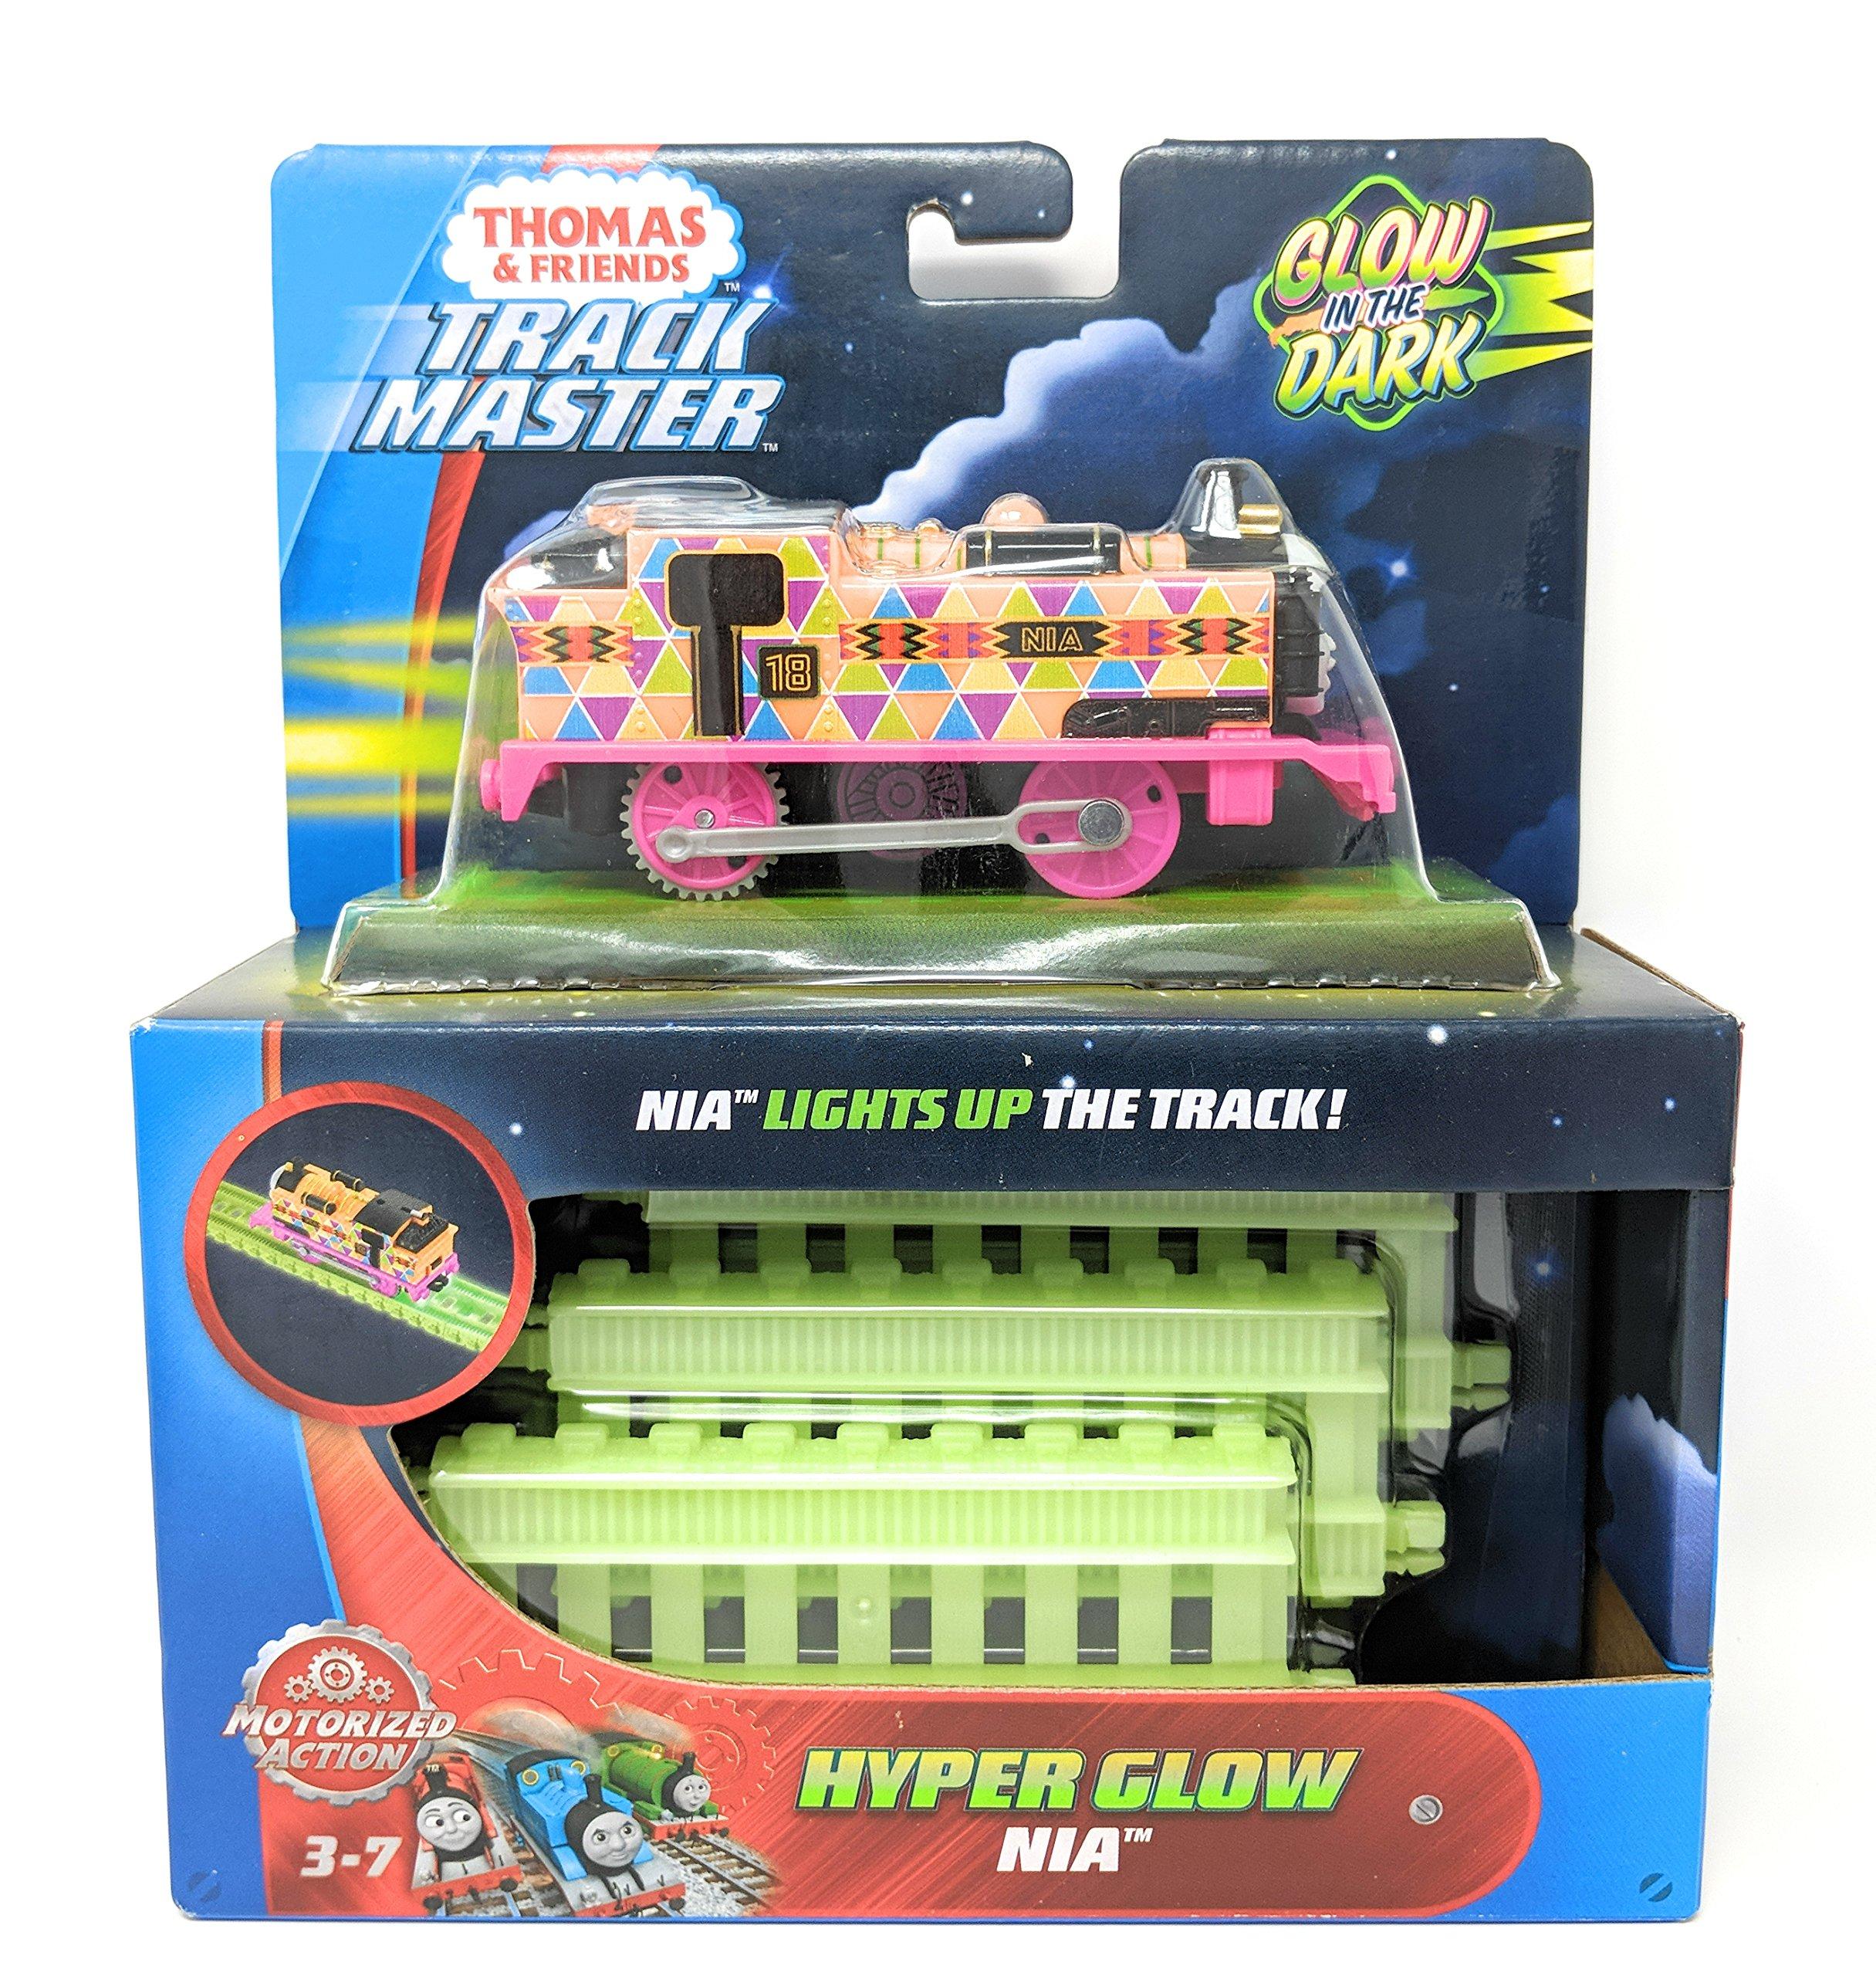 Thomas & Friends Fisher-Price TrackMaster, Motorized Hyper Glow Nia